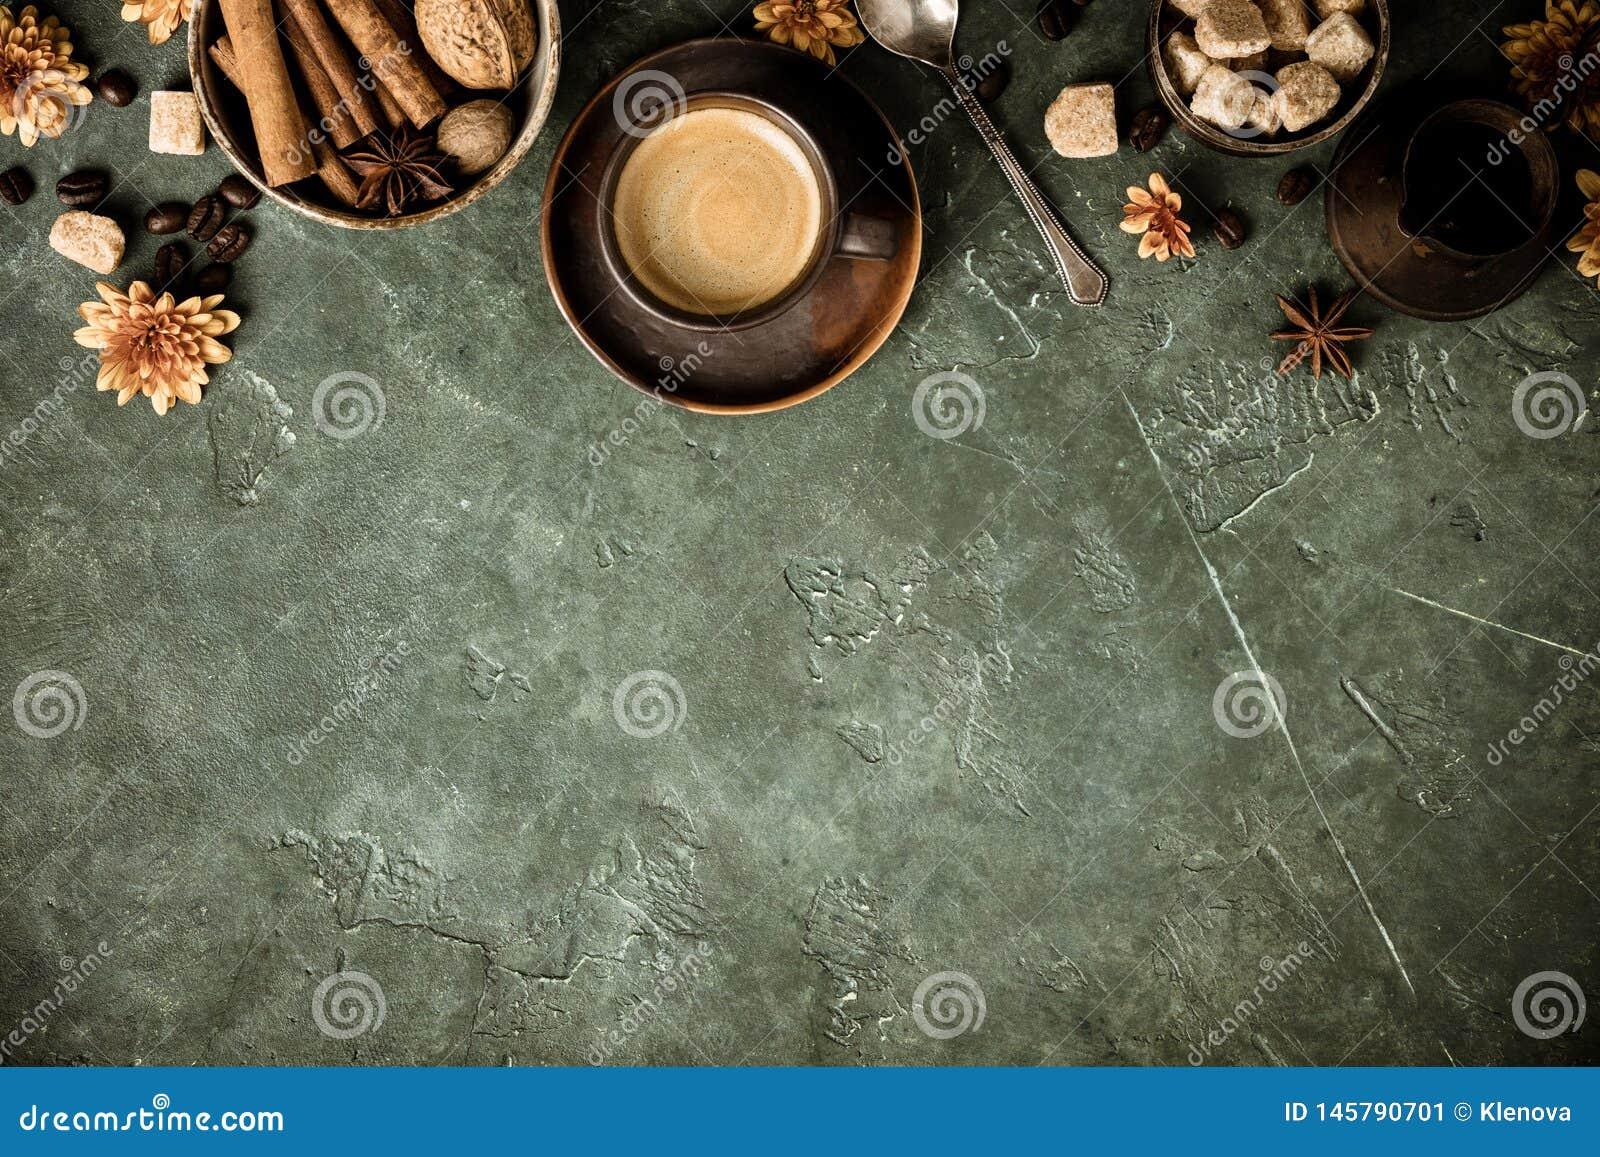 Koffie, bloemen en kruiden op oude groene achtergrond